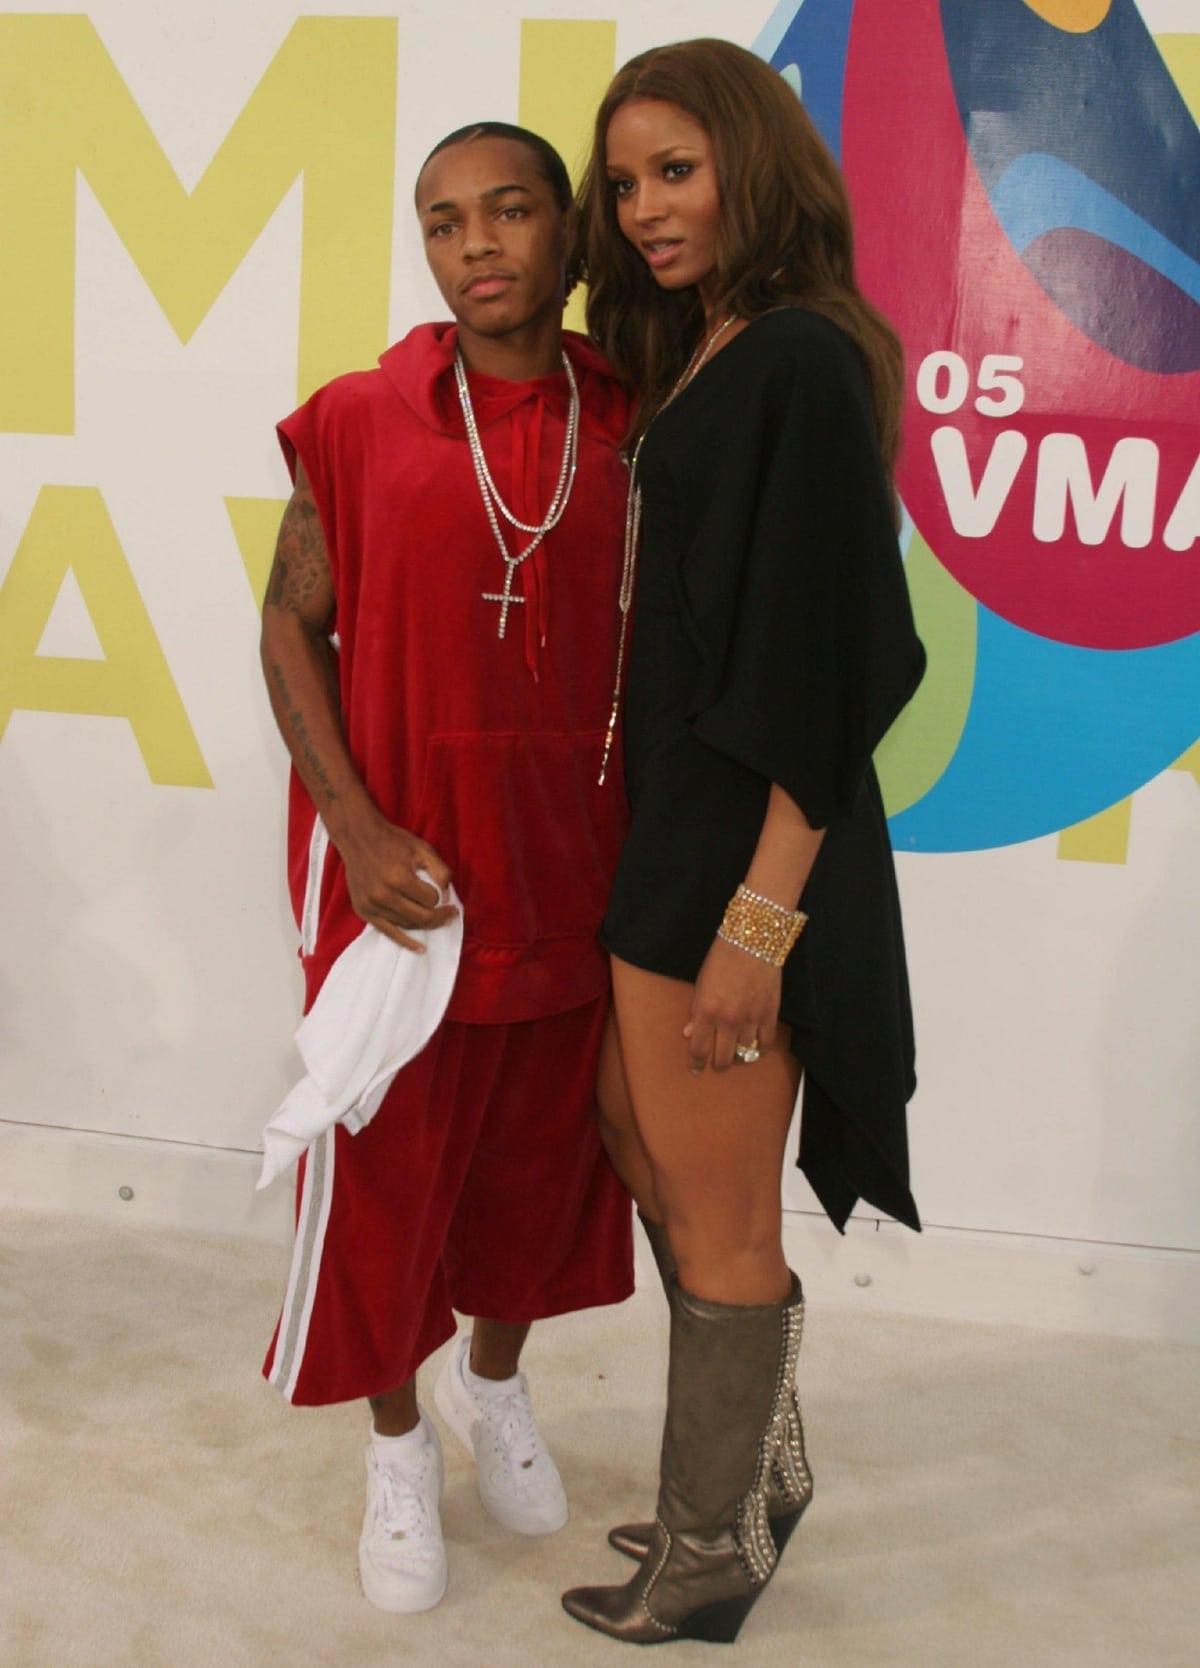 Bow Wow and his girlfriend Ciara at the 2005 MTV Video Music Awards